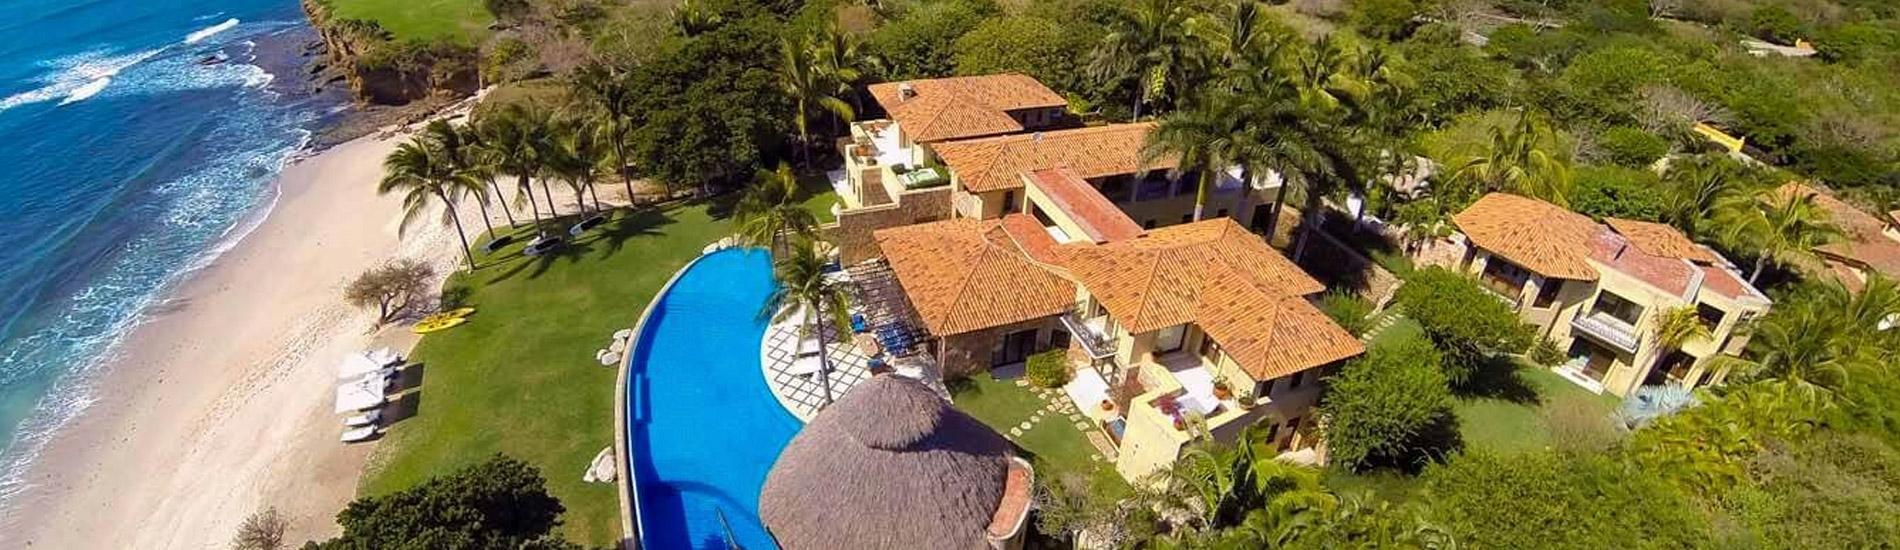 casa la vida dulce - punta mita | journey mexico luxury villas